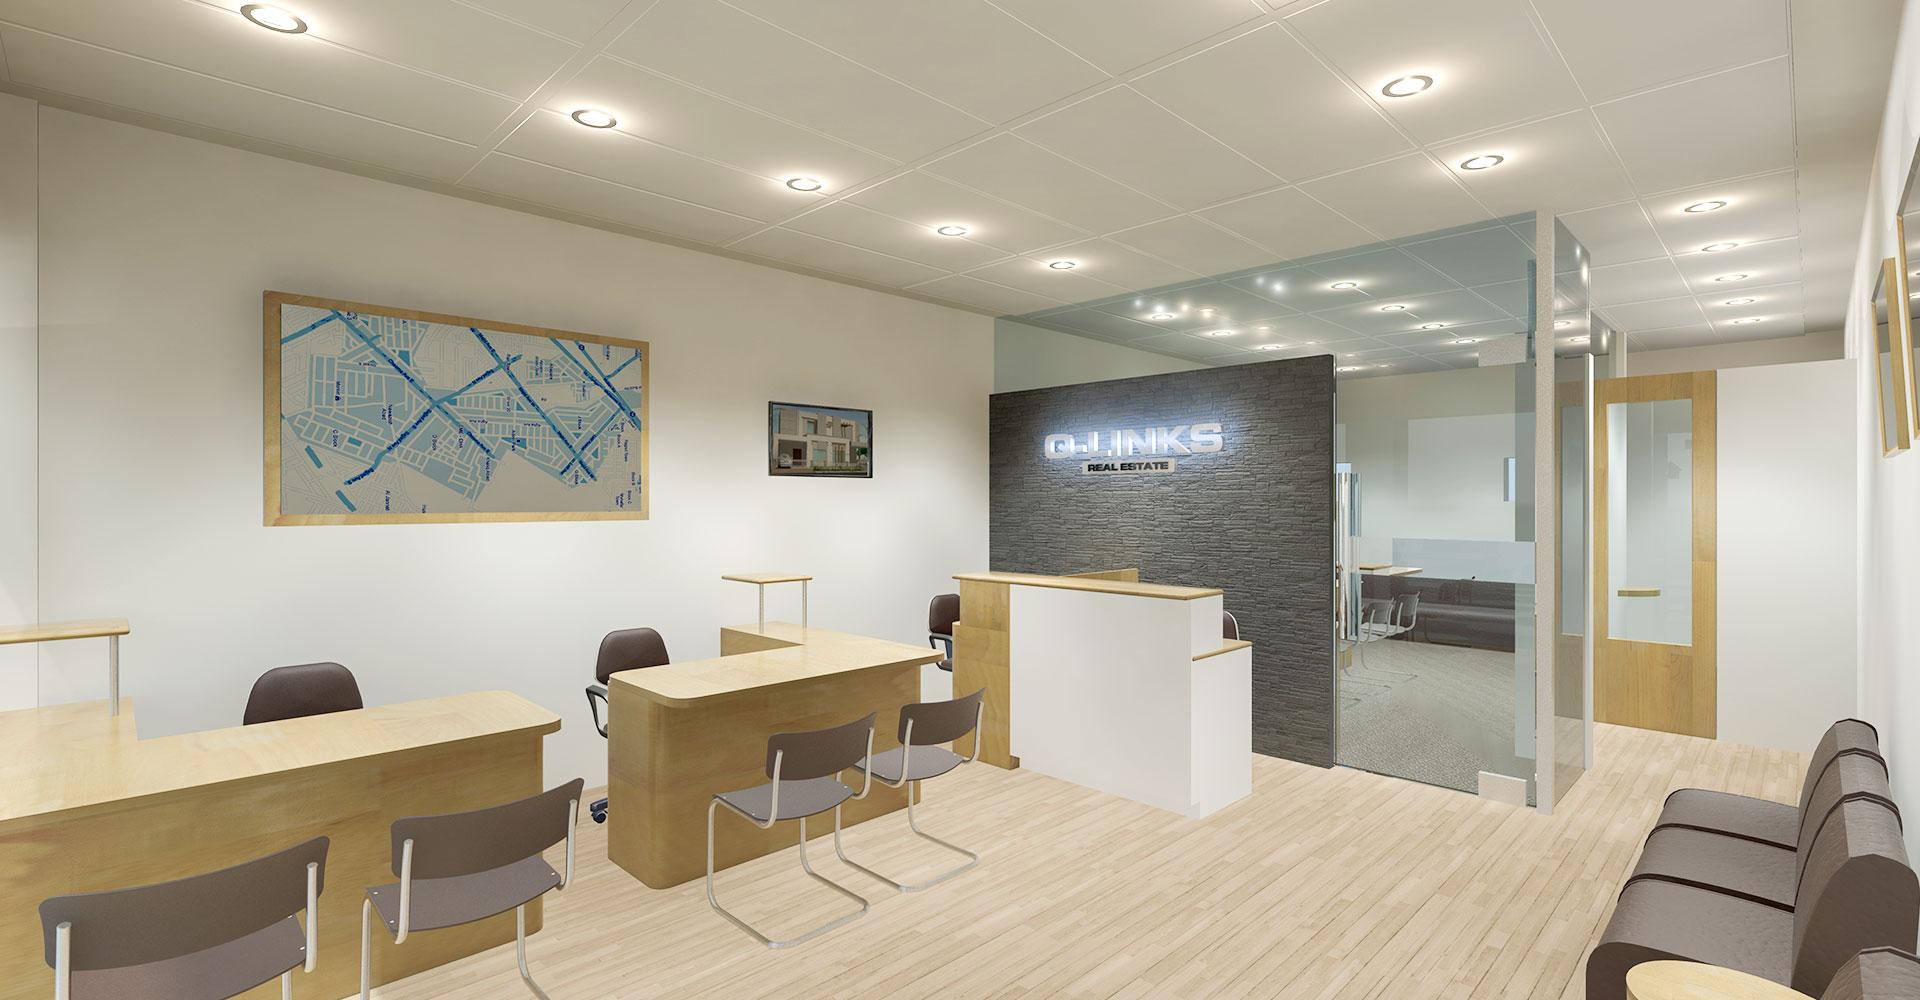 residential-restaurant-office-interior-3d-design-hiline-lahore-portfolio-(q-links-marketing-office)(1000×1000)-09